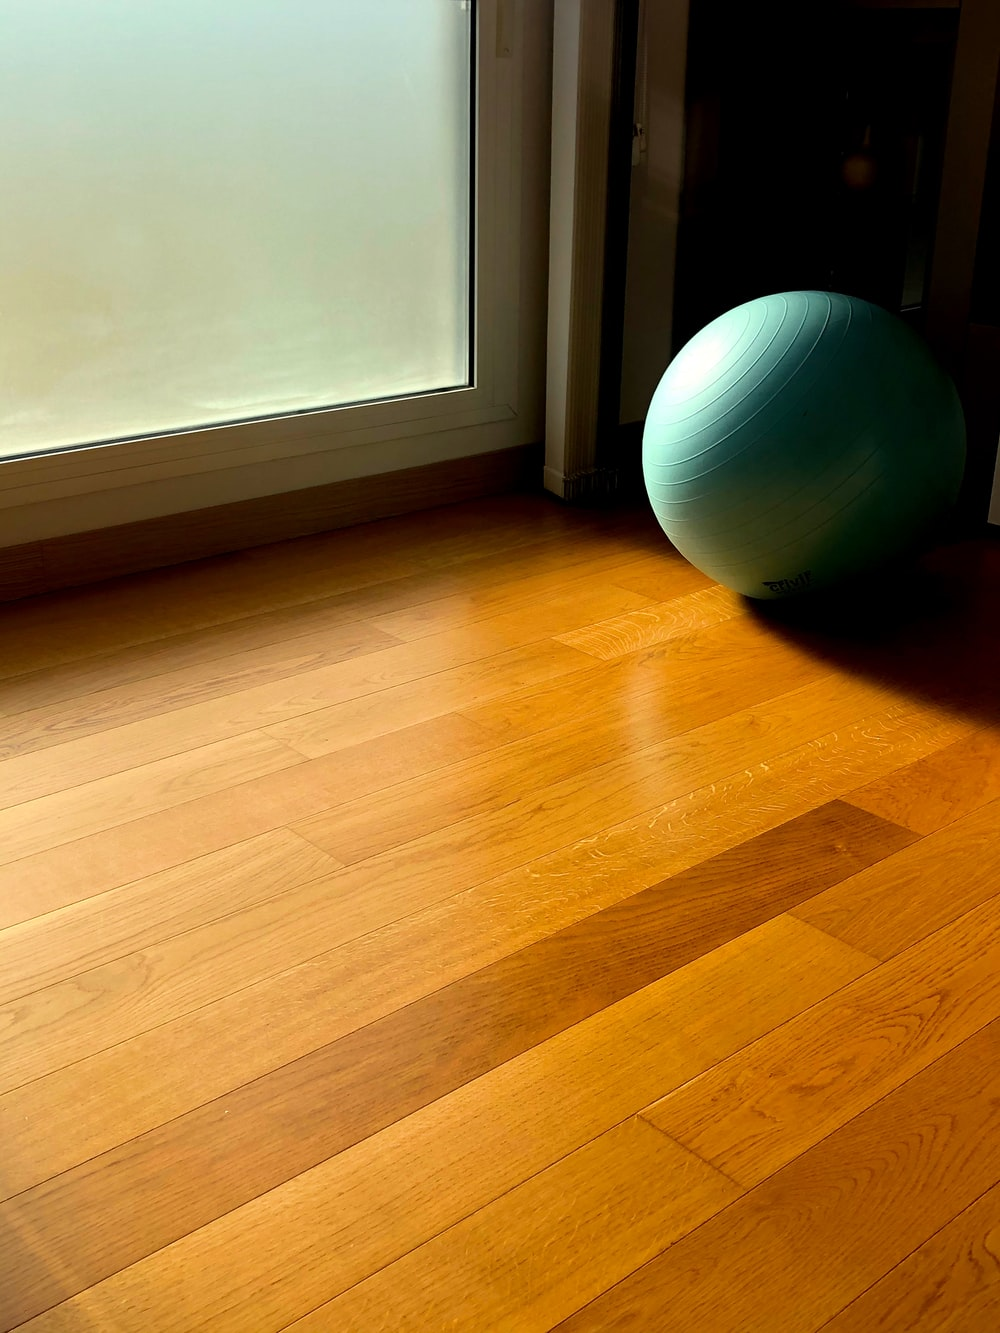 green fitness ball on parquet floor